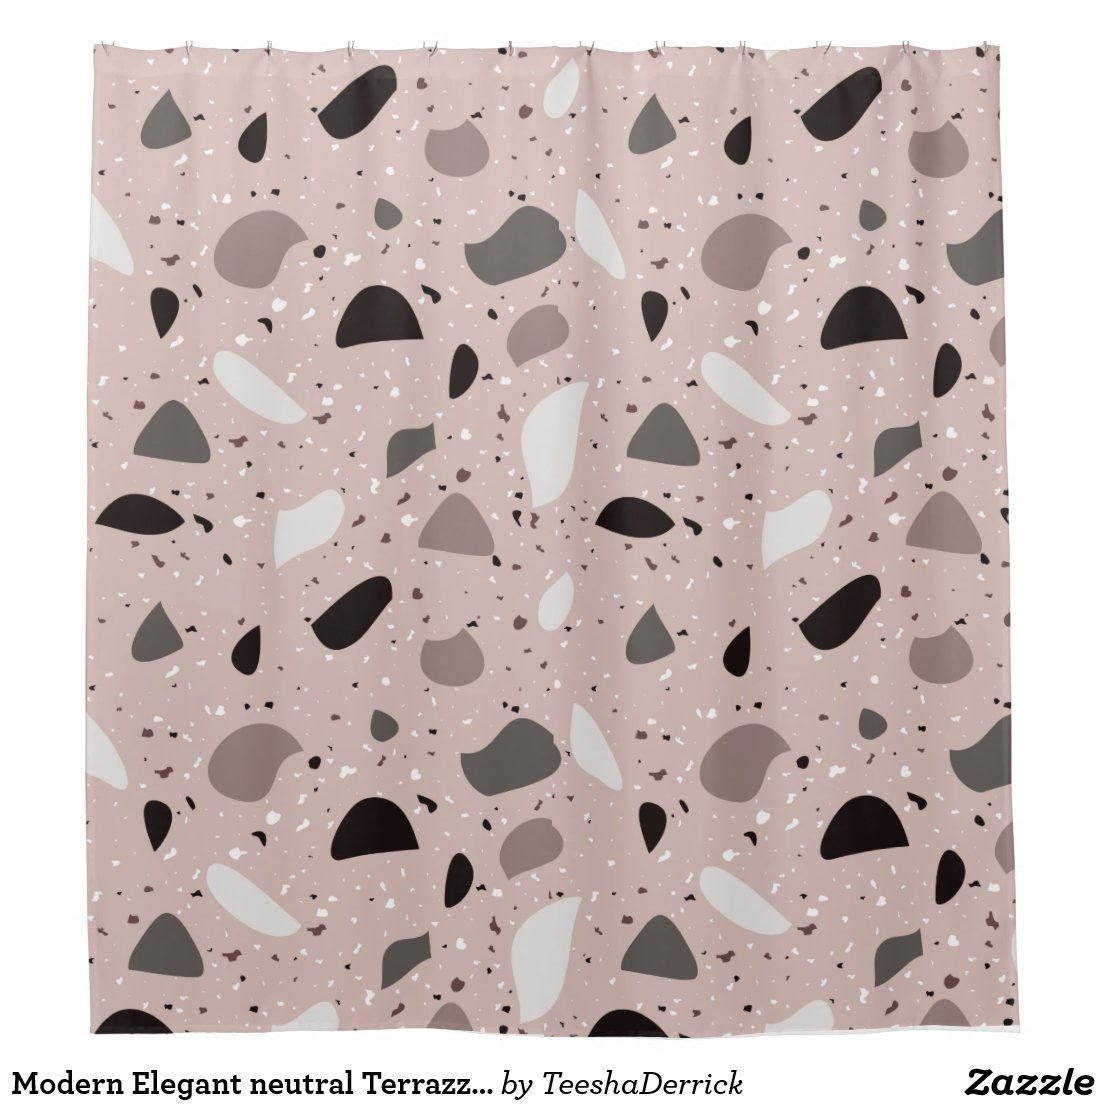 Modern Elegant neutral Terrazzo Natural Patterns Shower Curtain | Zazzle.com